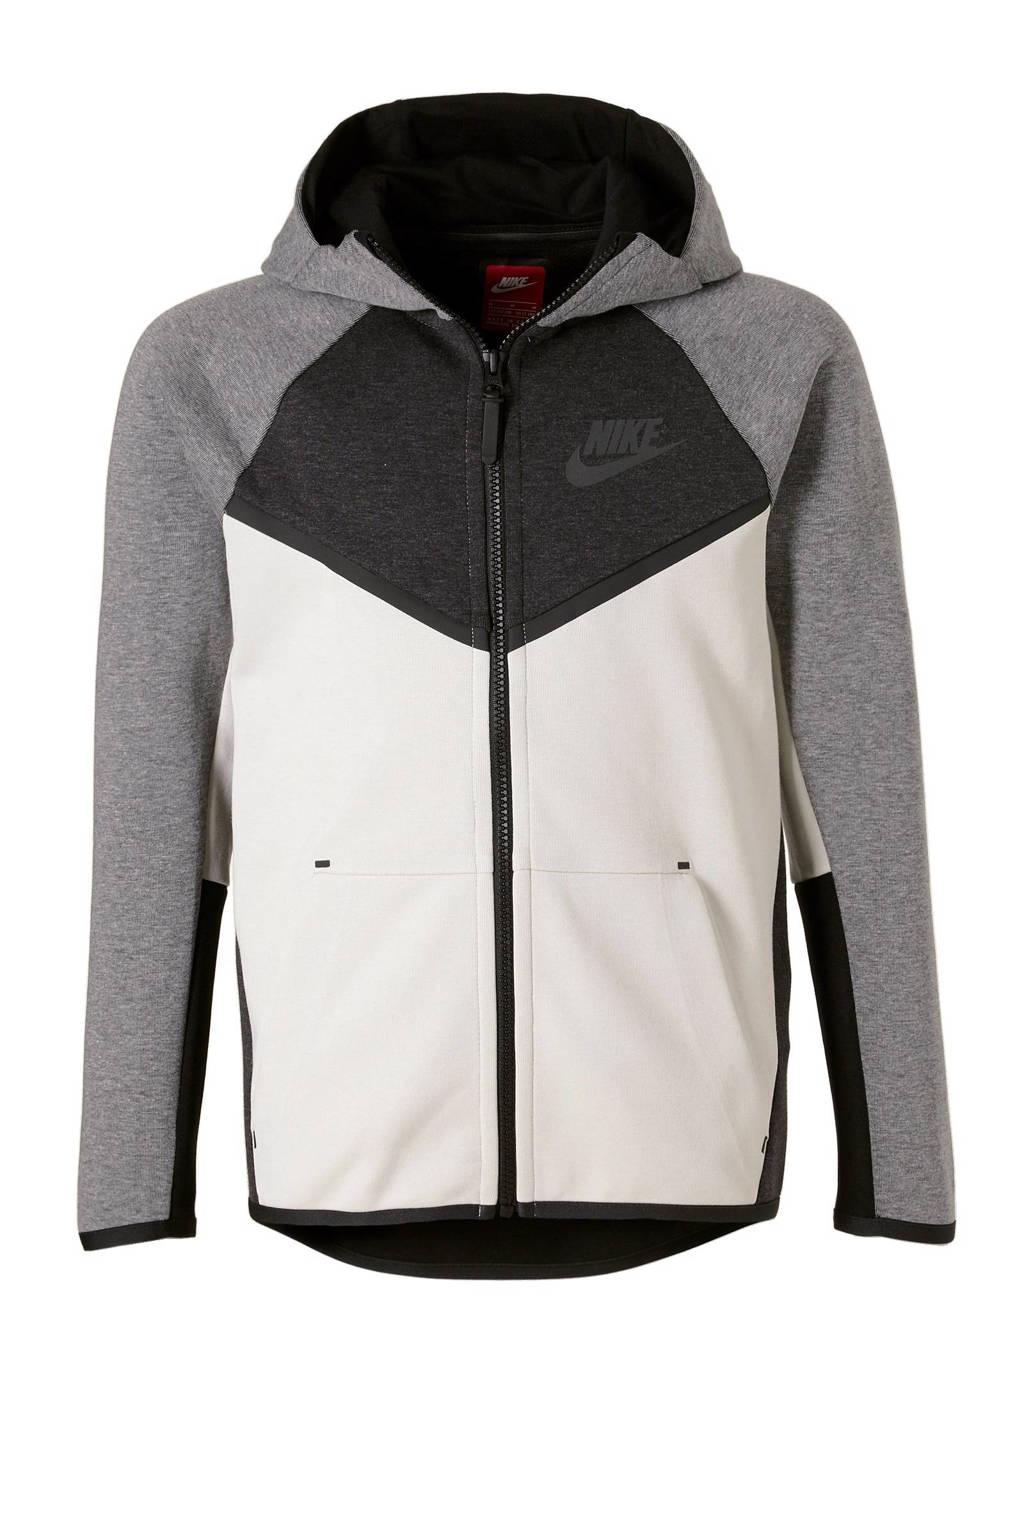 60cbff7a1db5 Nike Tech fleece vest